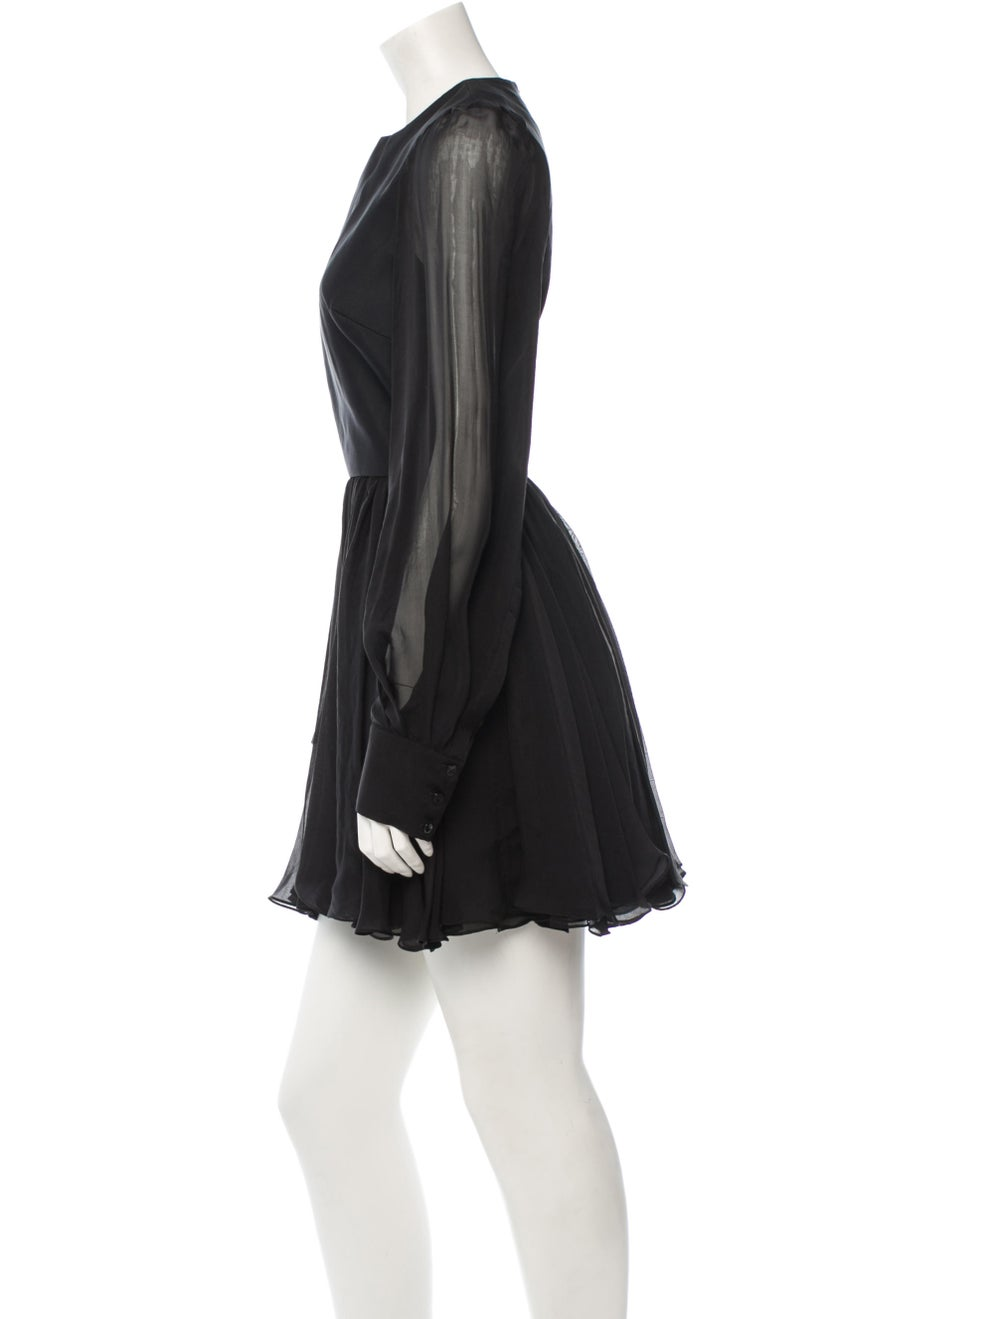 Plein Sud Silk Dress Black - image 2